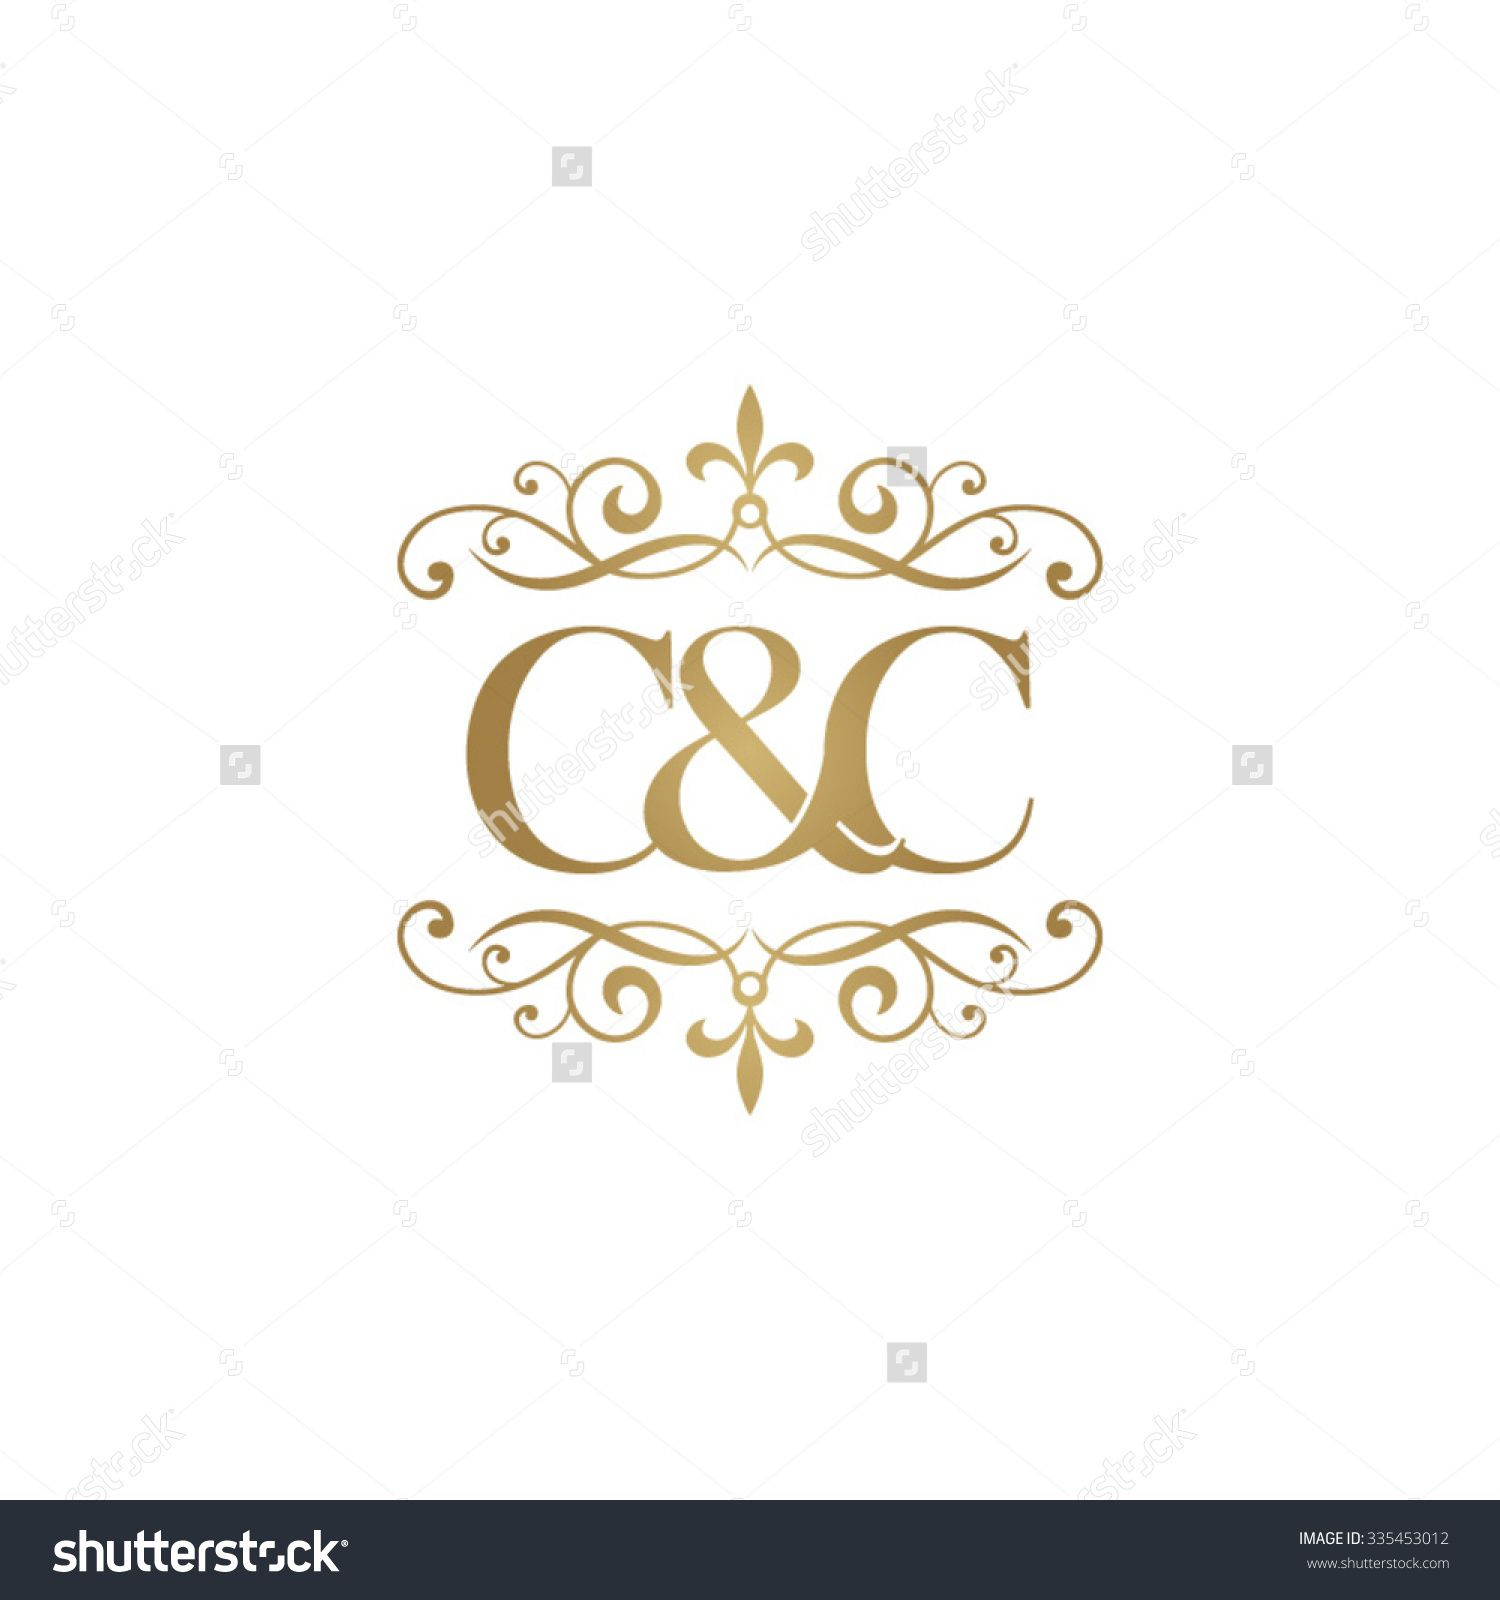 C&C Initial Logo. Ornament Ampersand Monogram Golden Logo